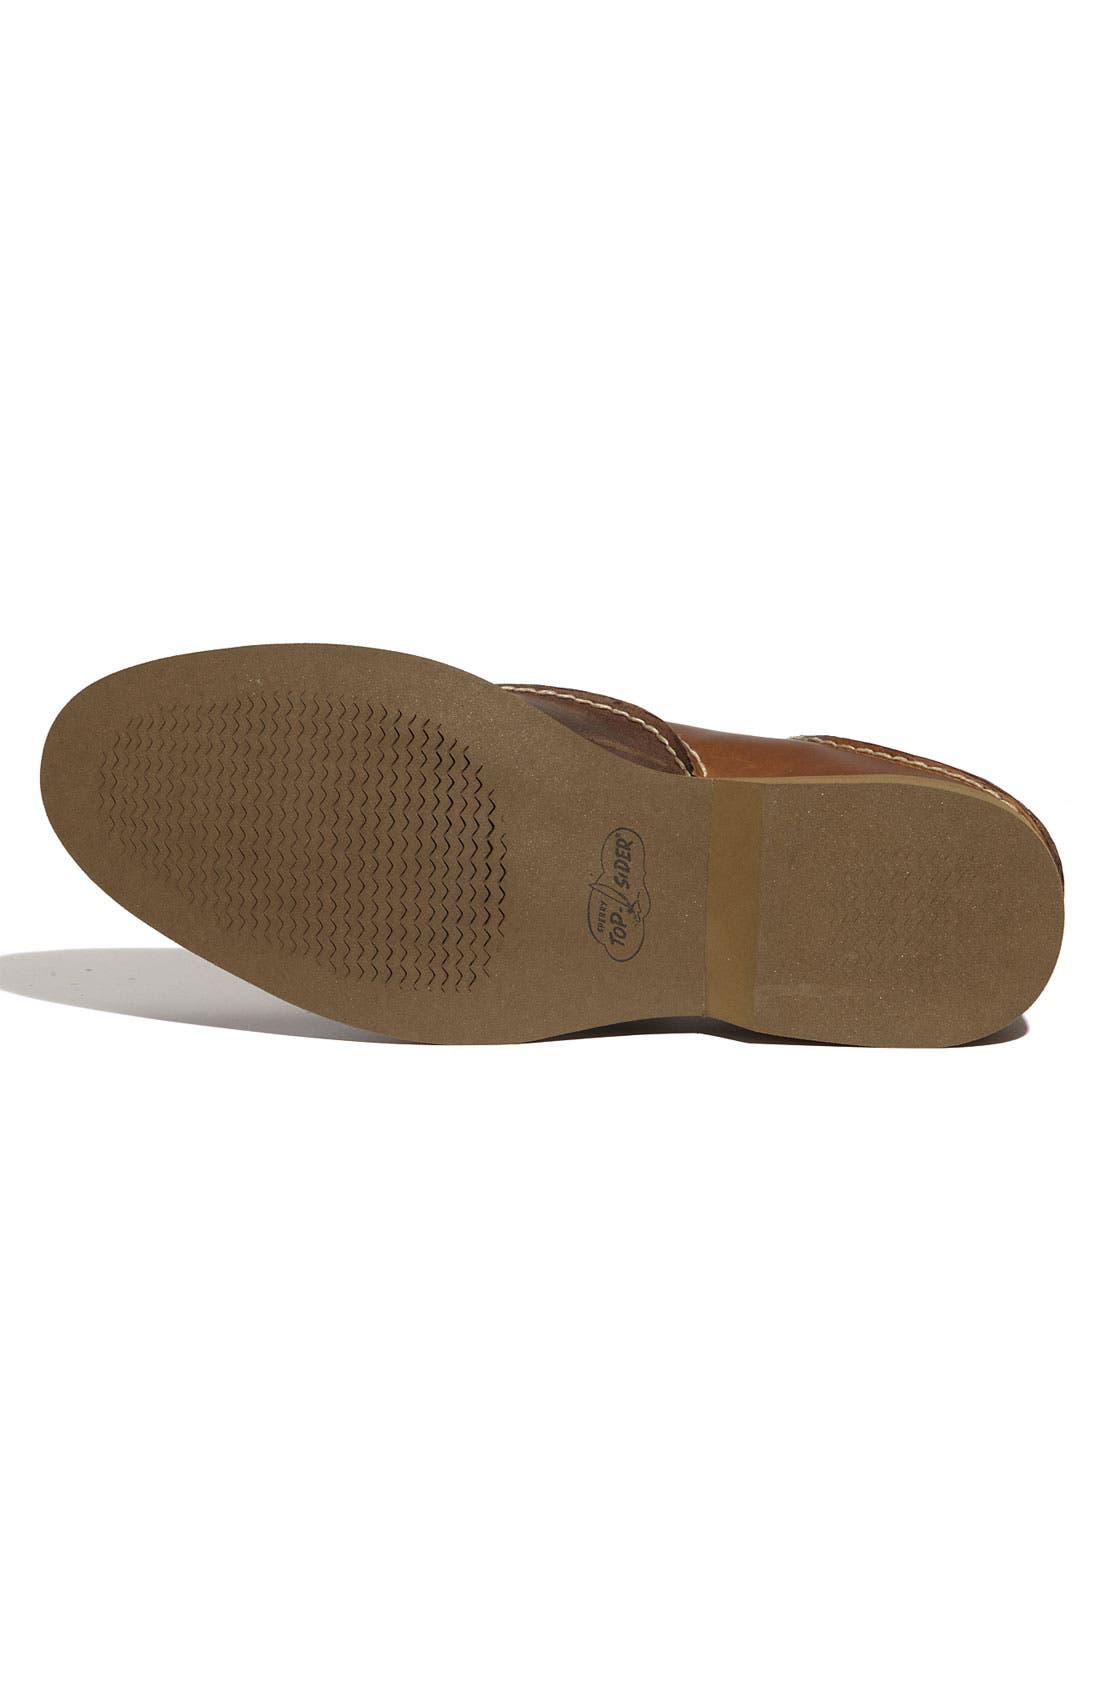 Alternate Image 4  - Sperry Top-Sider® 'Boat' Oxford Saddle Shoe